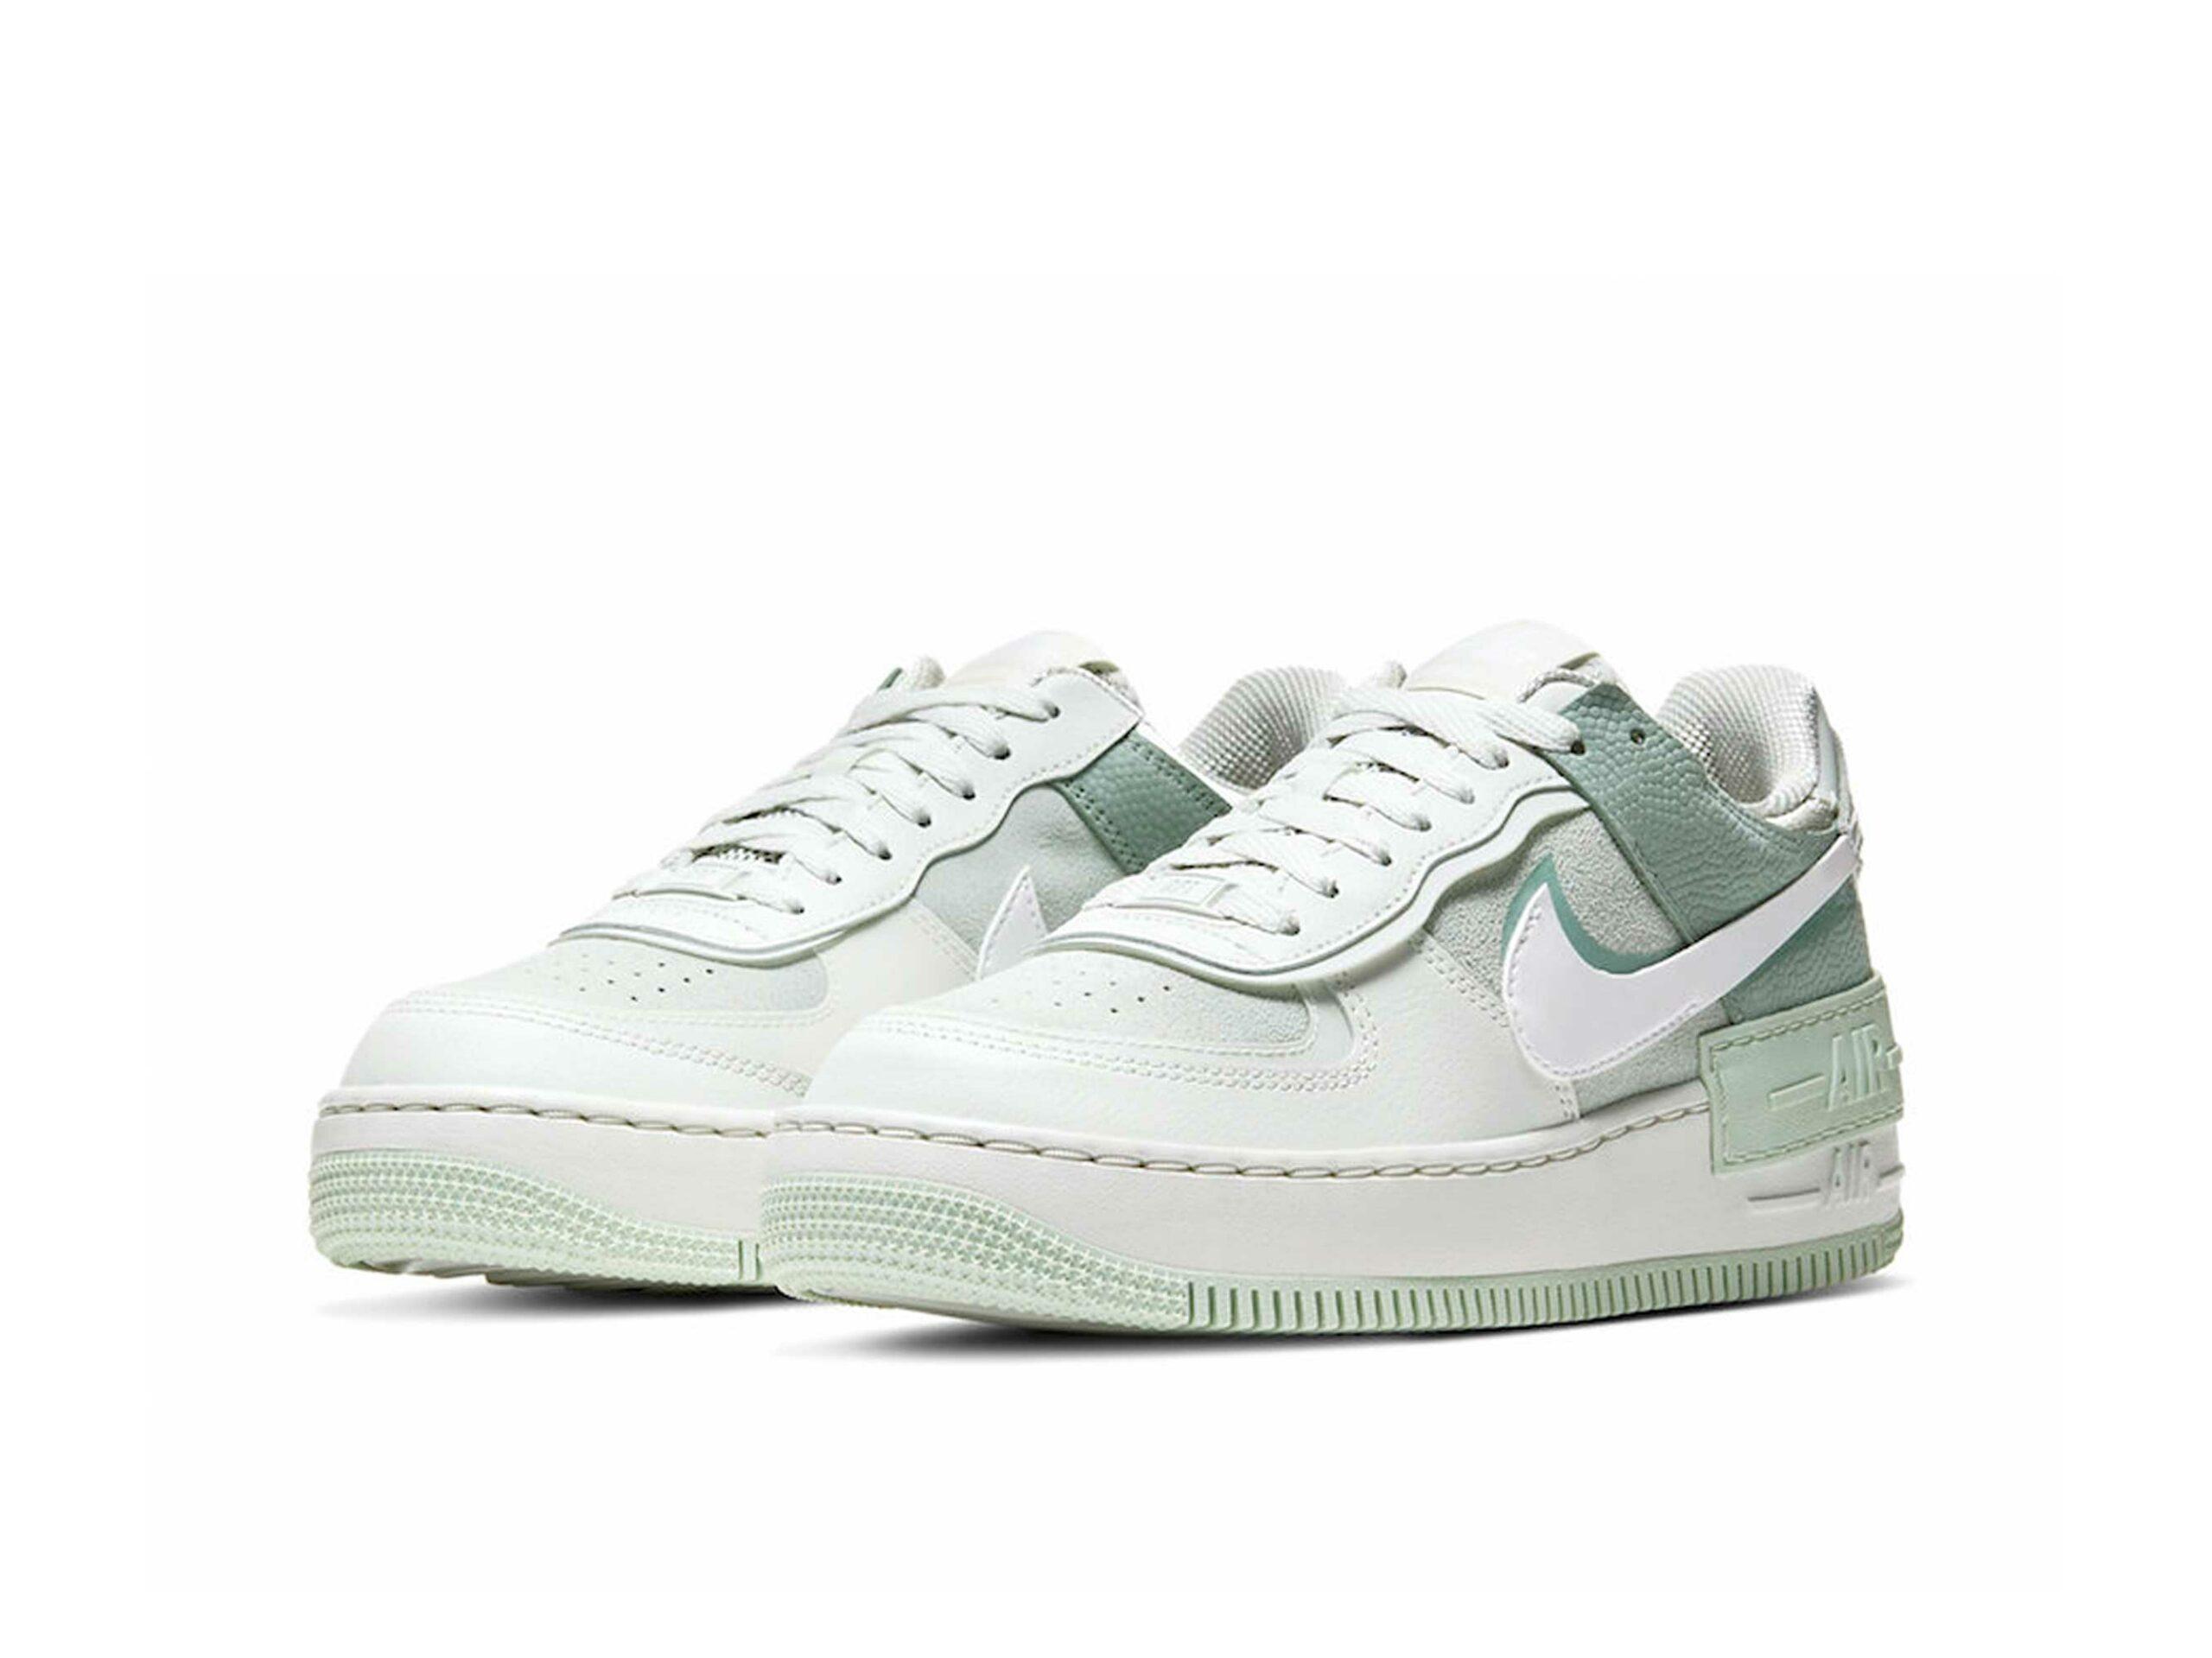 nike air force 1 shadow pistachio frost cw2655 _001 купить